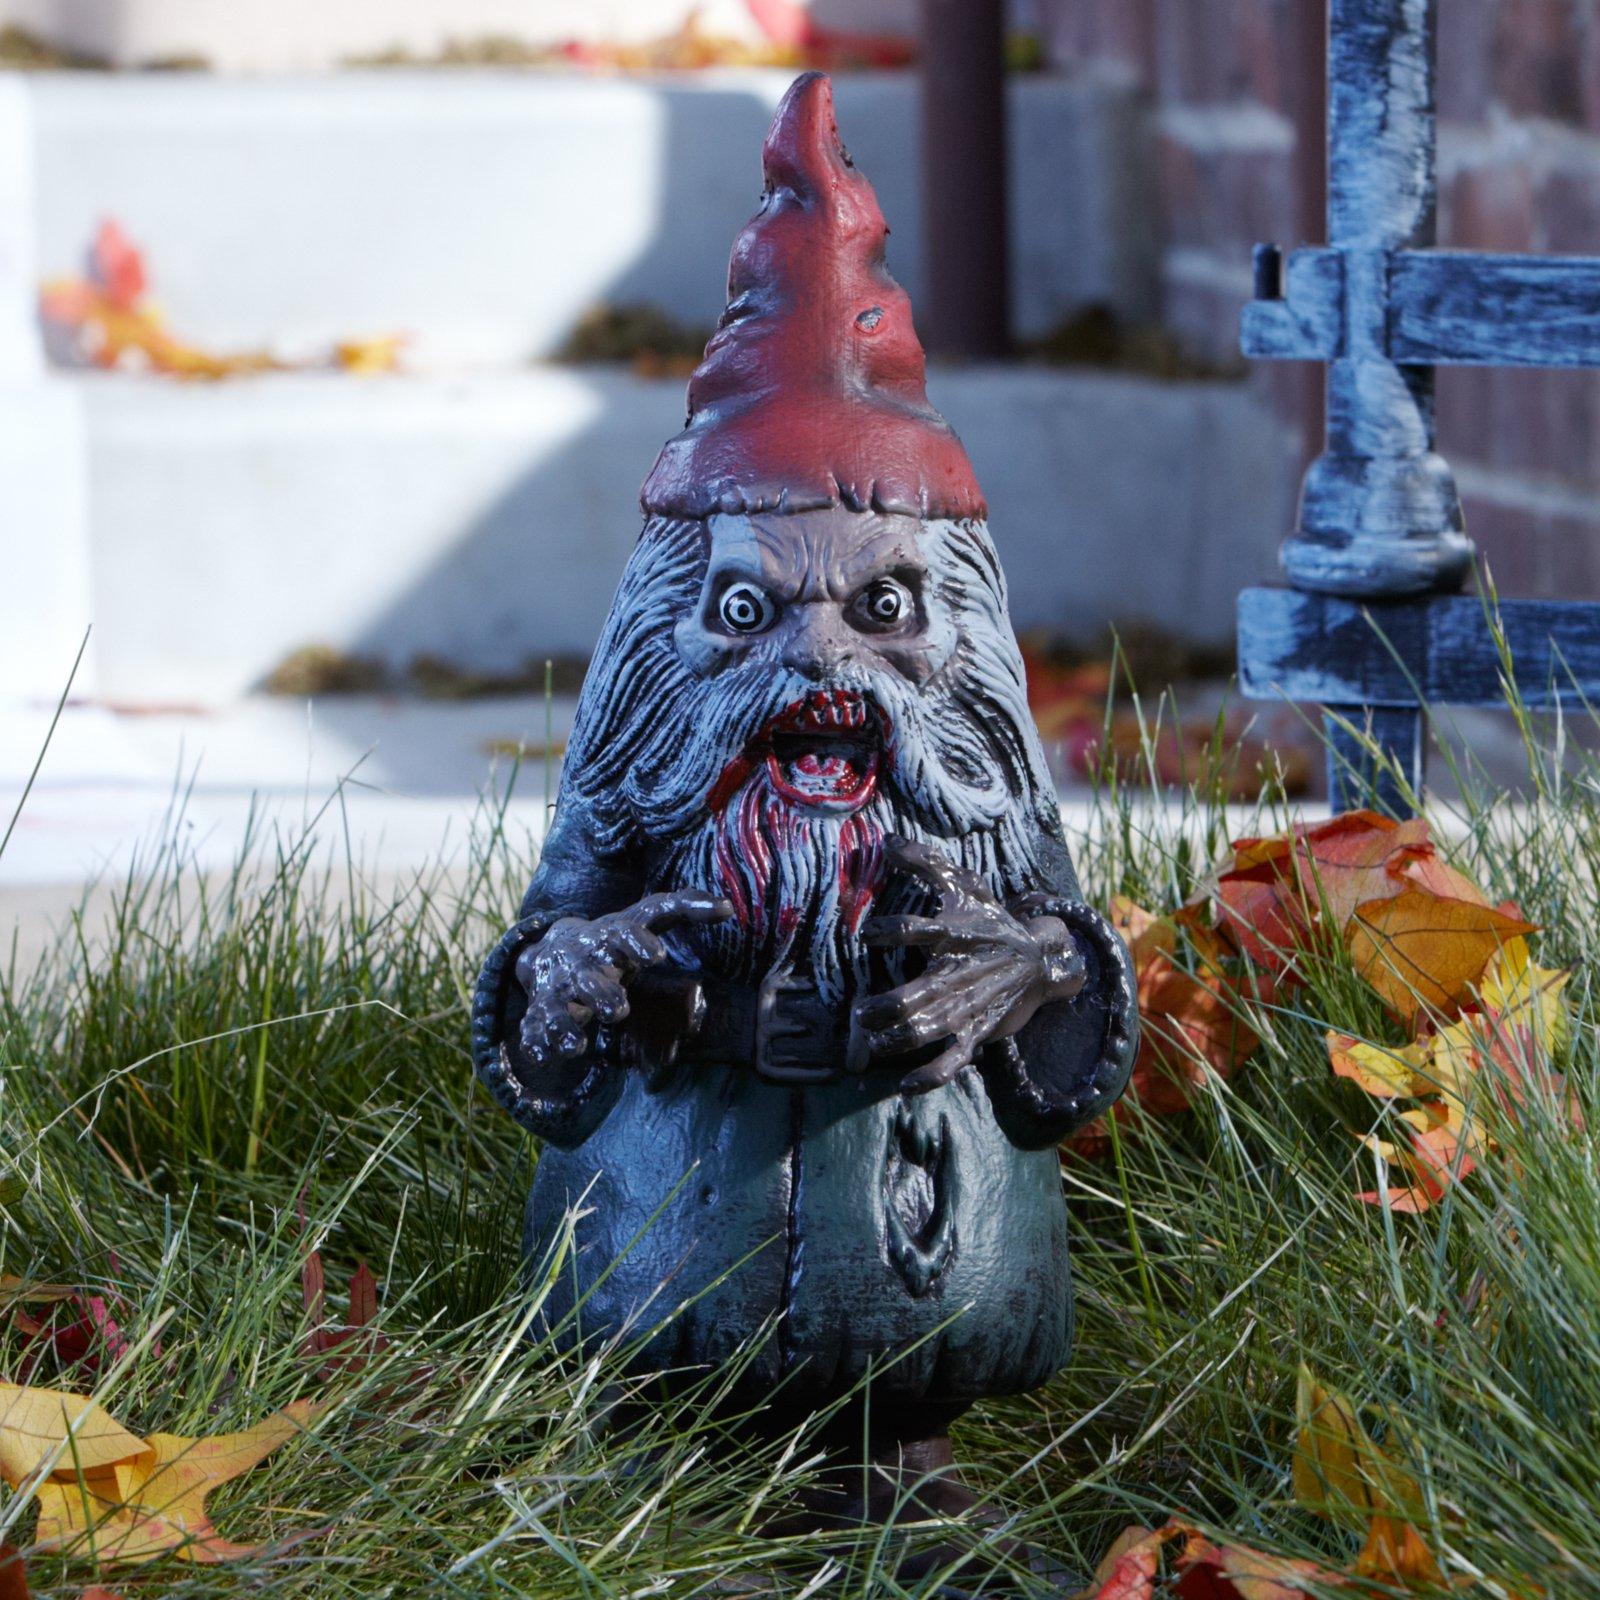 zombie-garden-gnome-silver-red | Zombie Garden Gnome - Silver/red ...